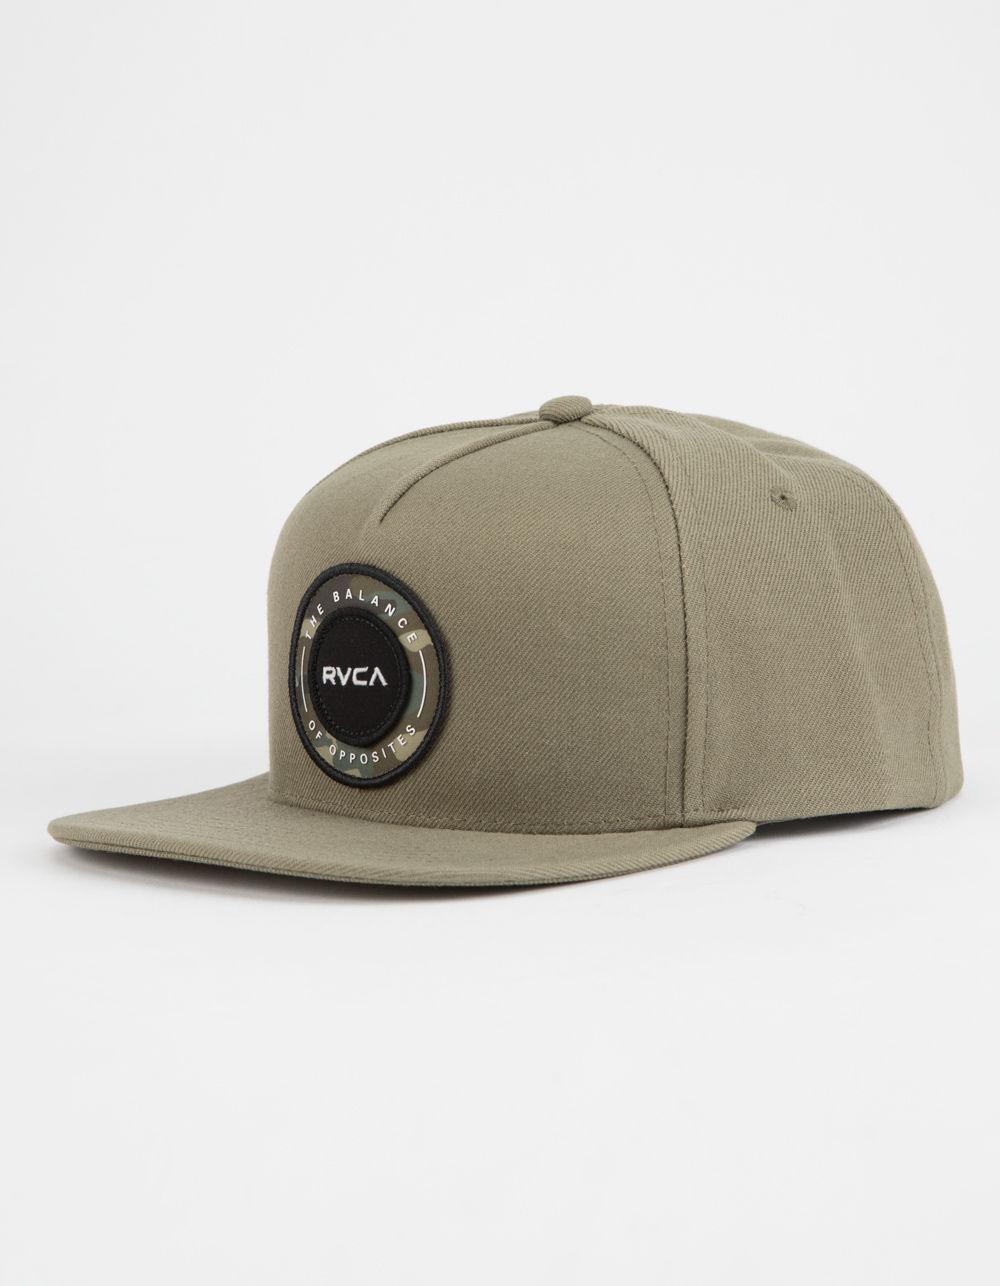 81402db3d71 Lyst - Rvca Radius Mens Snapback Hat in Green for Men